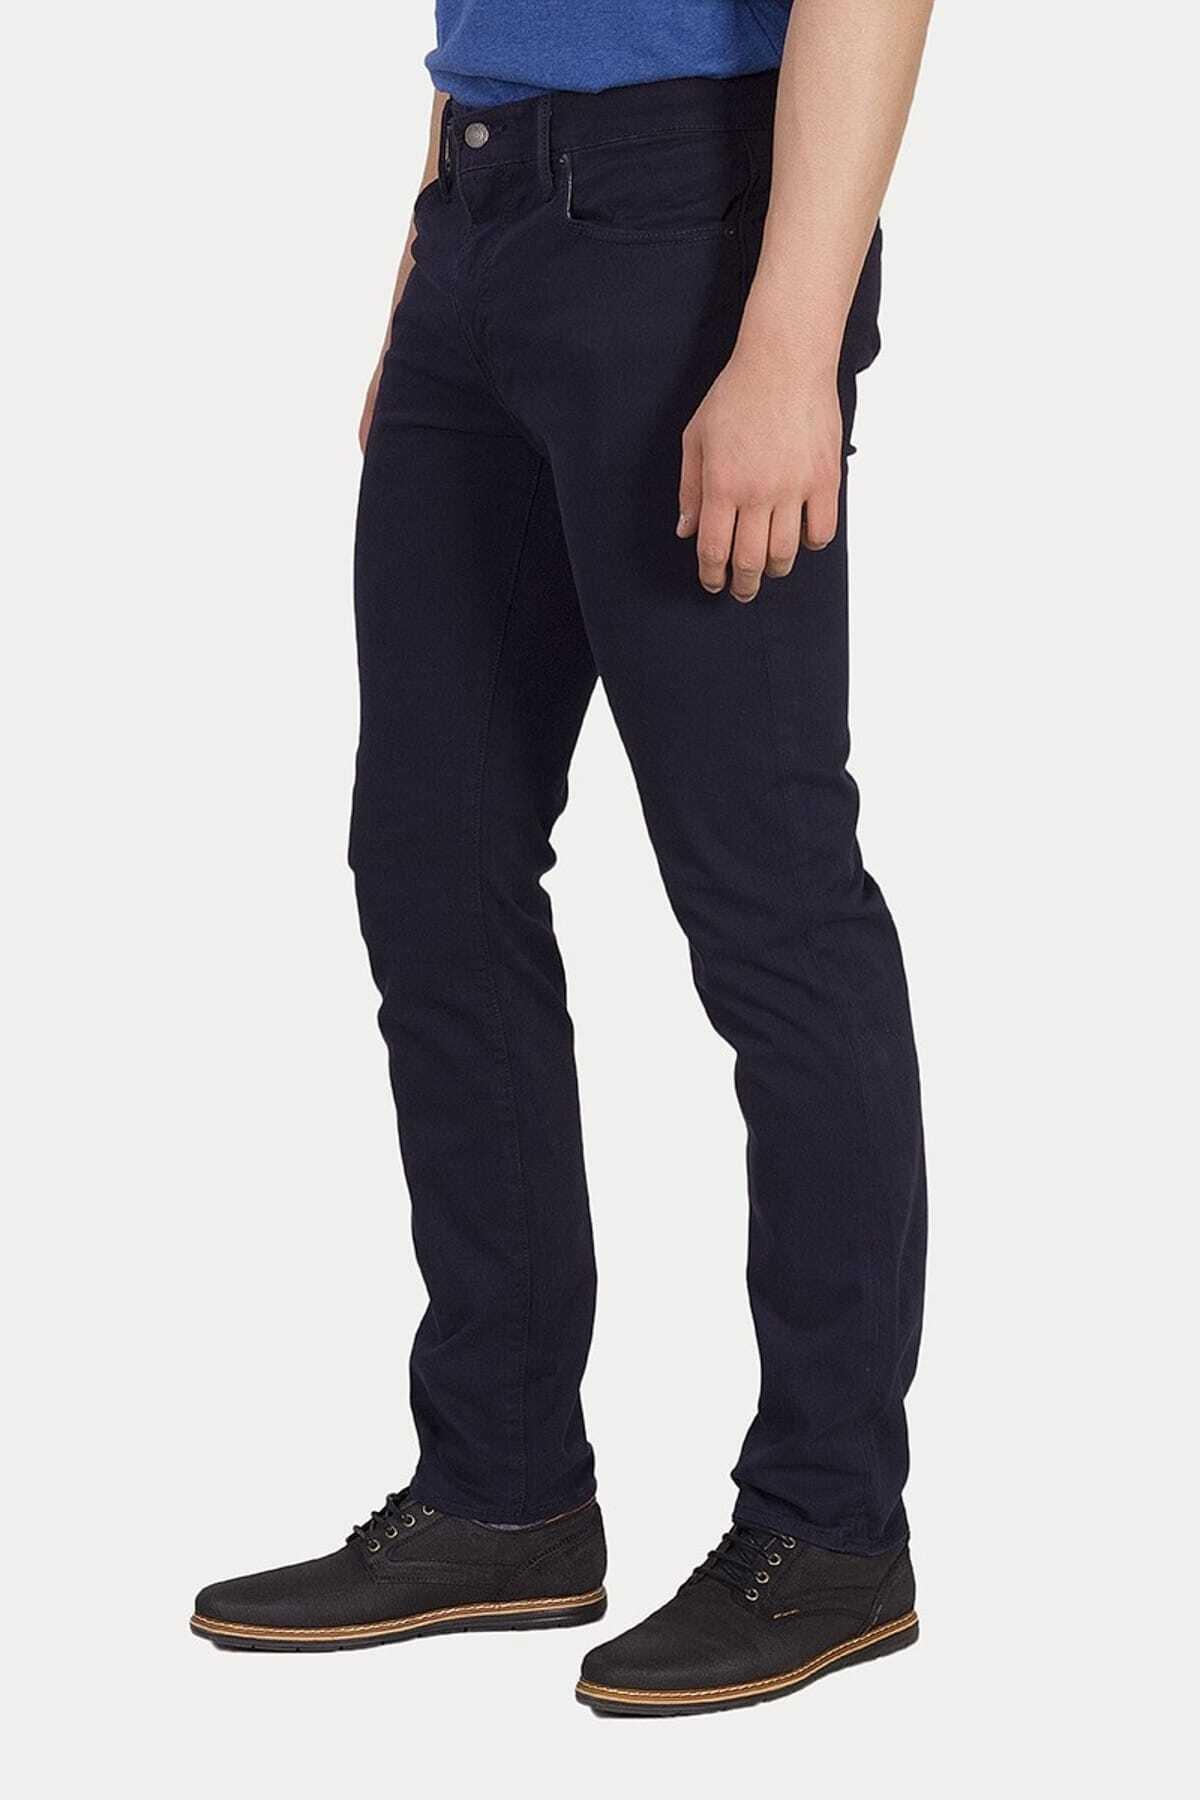 Levi's Erkek Jean 511 Slim Fit 04511-2617 2